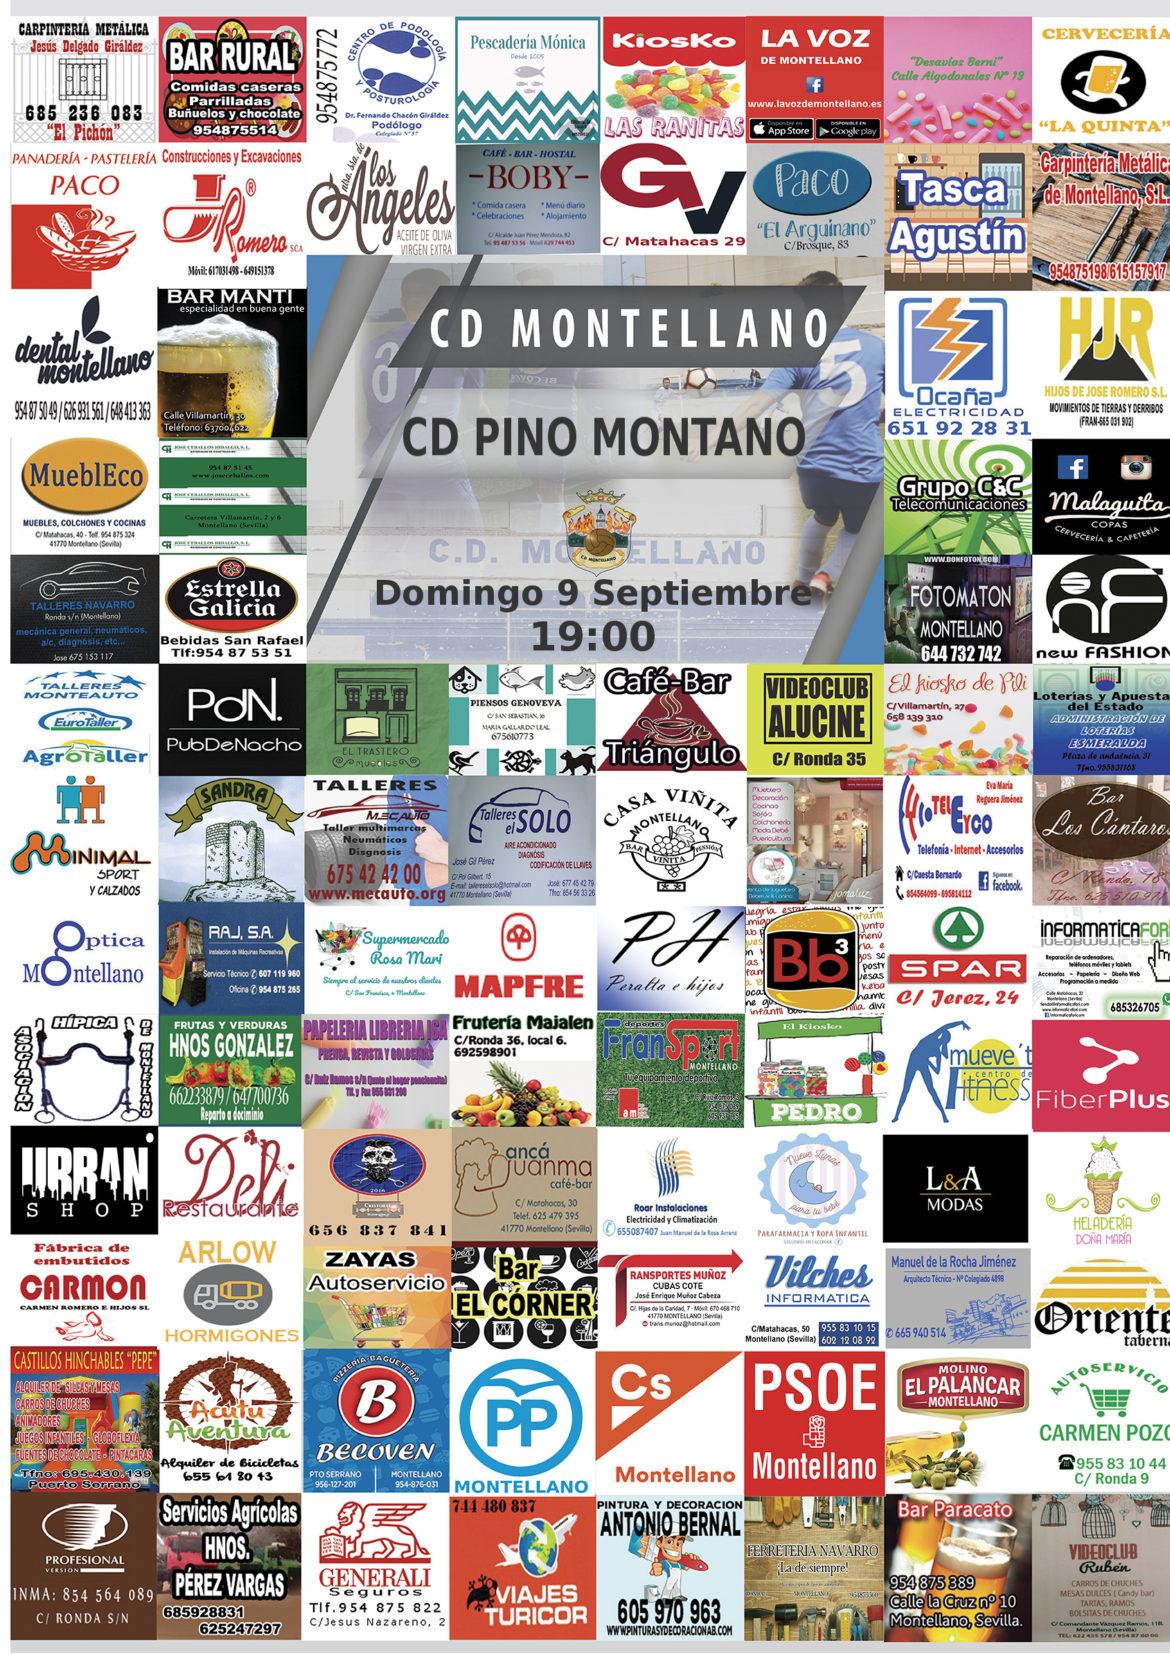 jornada 2 cd montellano - cd pino montano